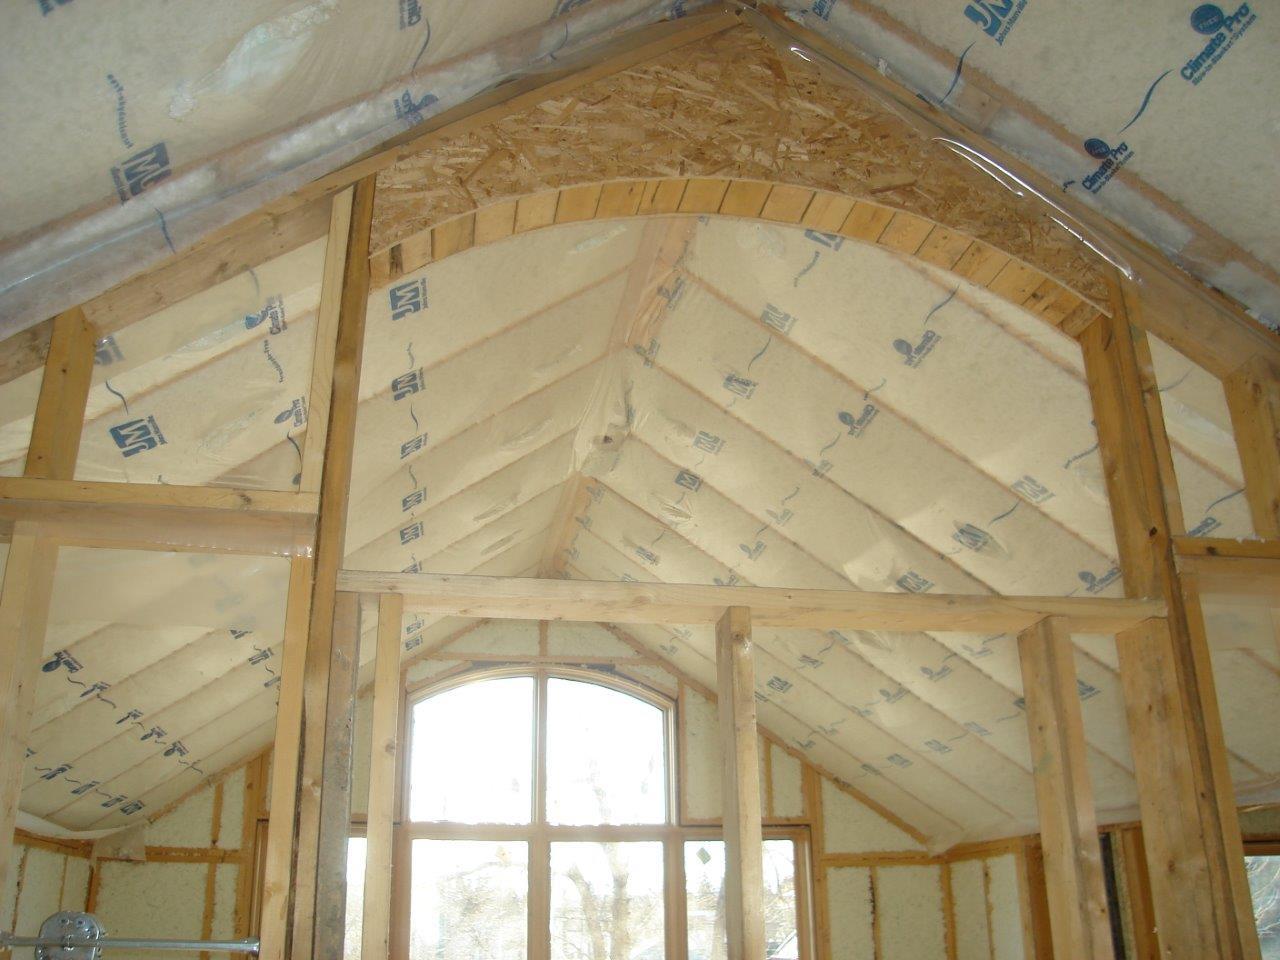 jm spider installed in vaulted ceiling